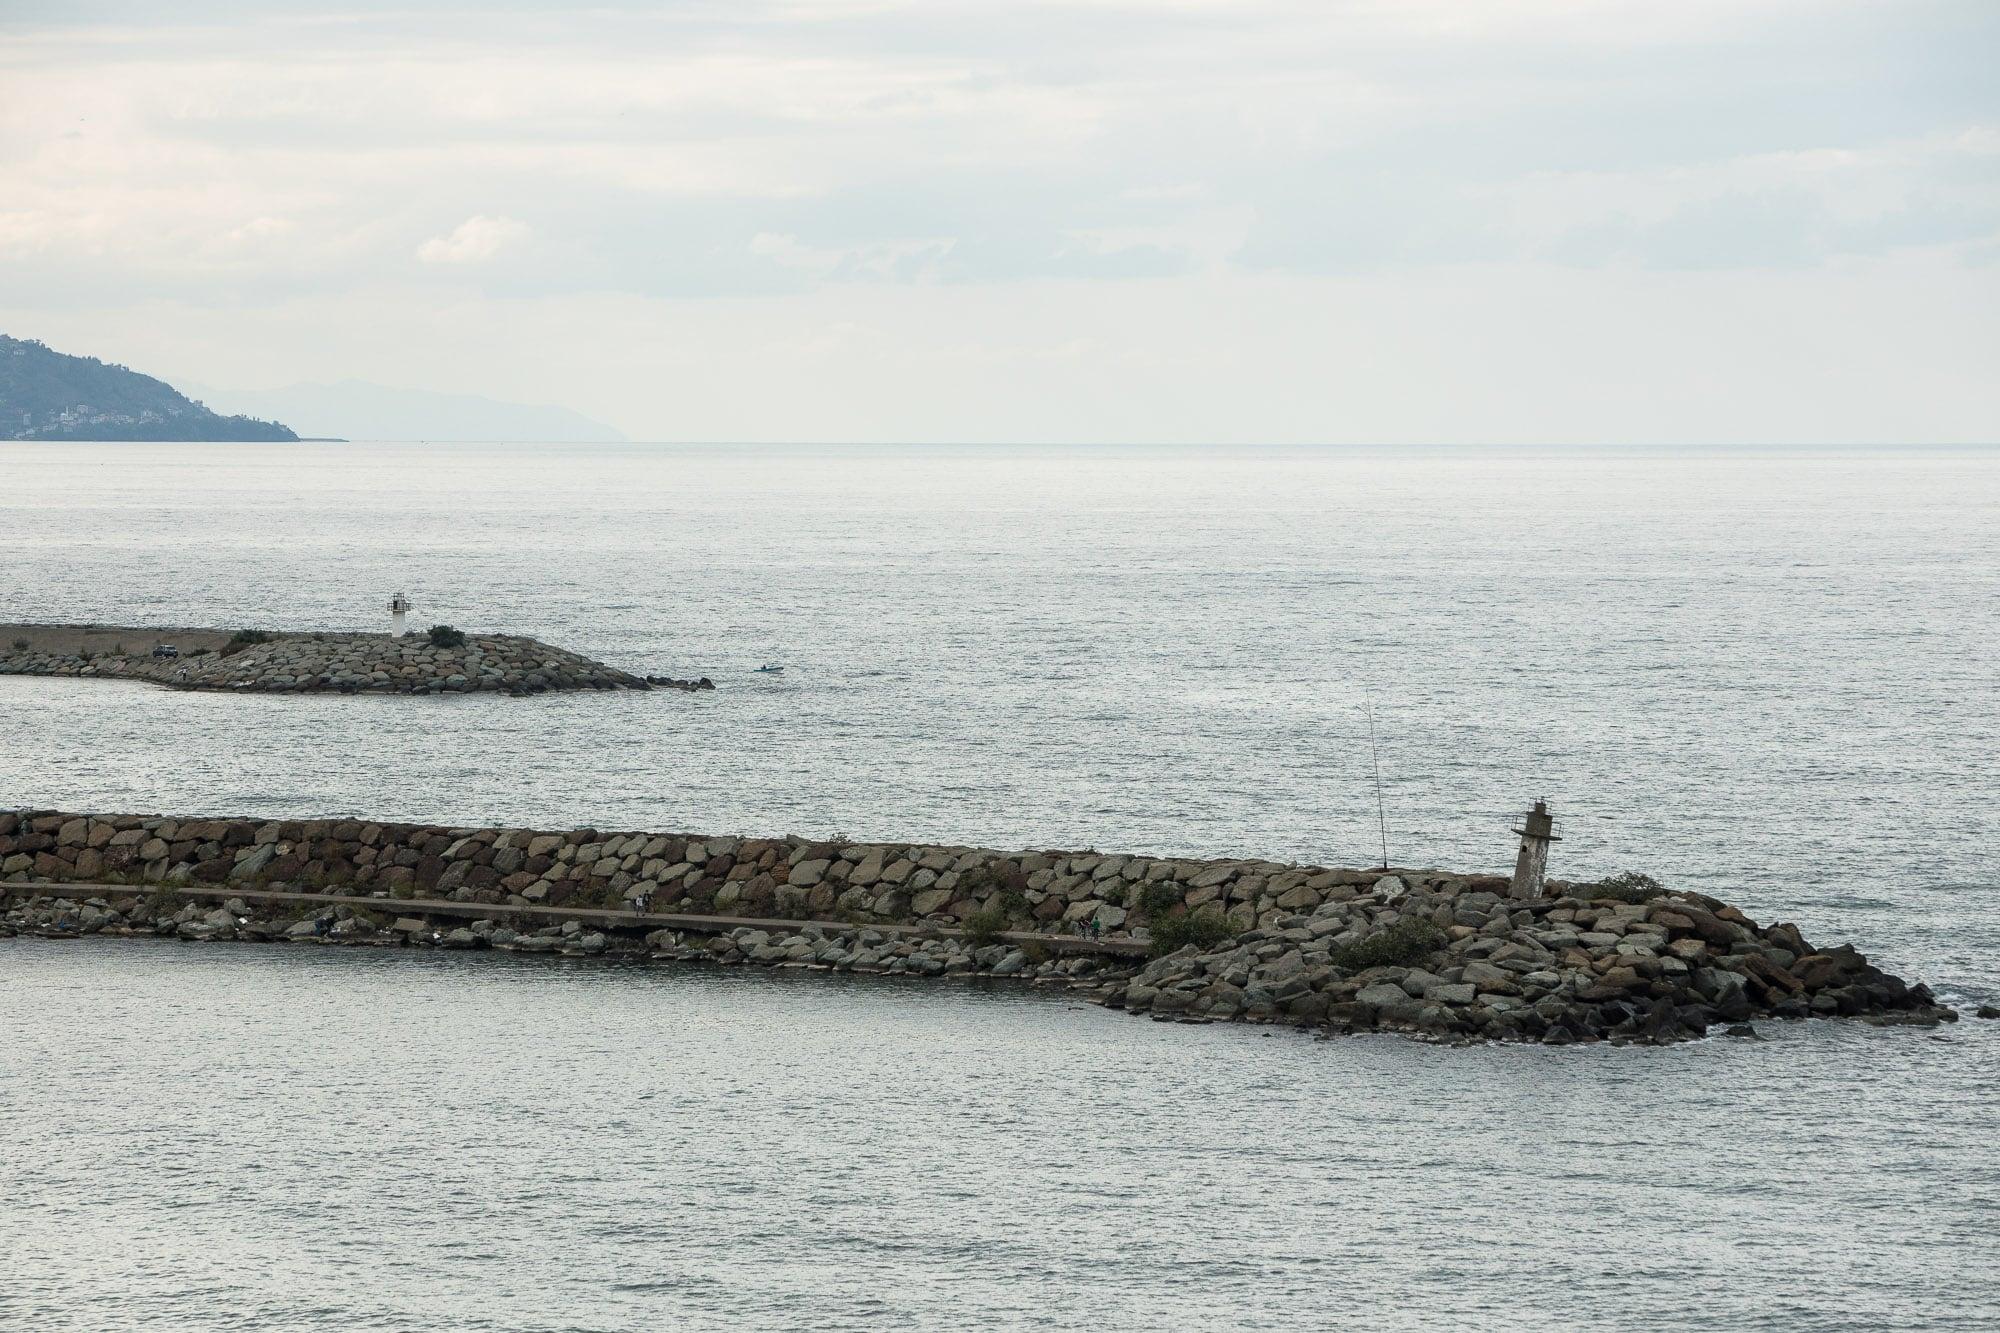 piers in the Black Sea